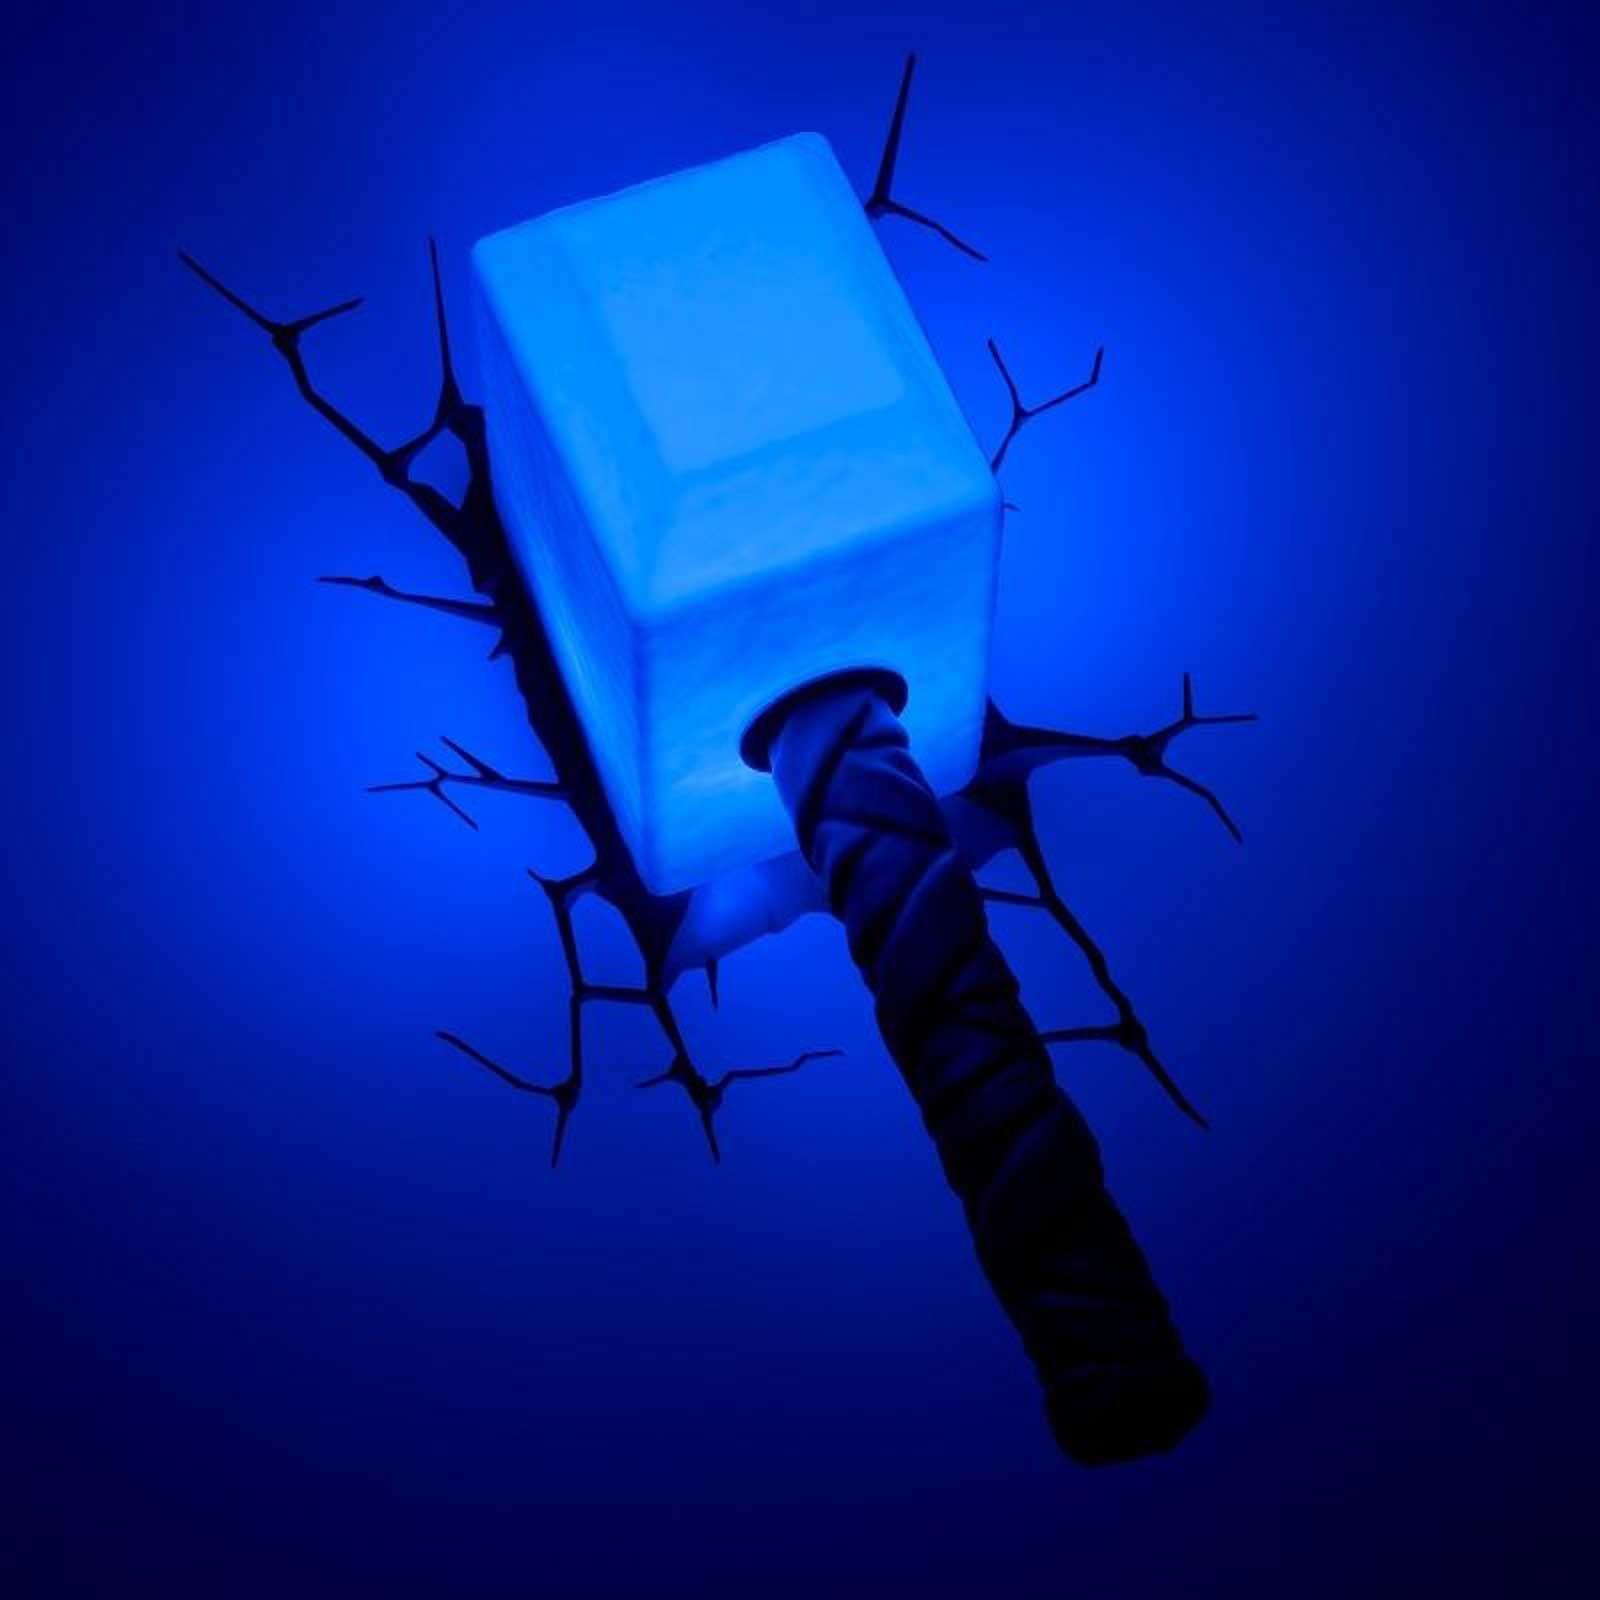 Details about marvel avengers thor hammer 3d led wall light lamp new